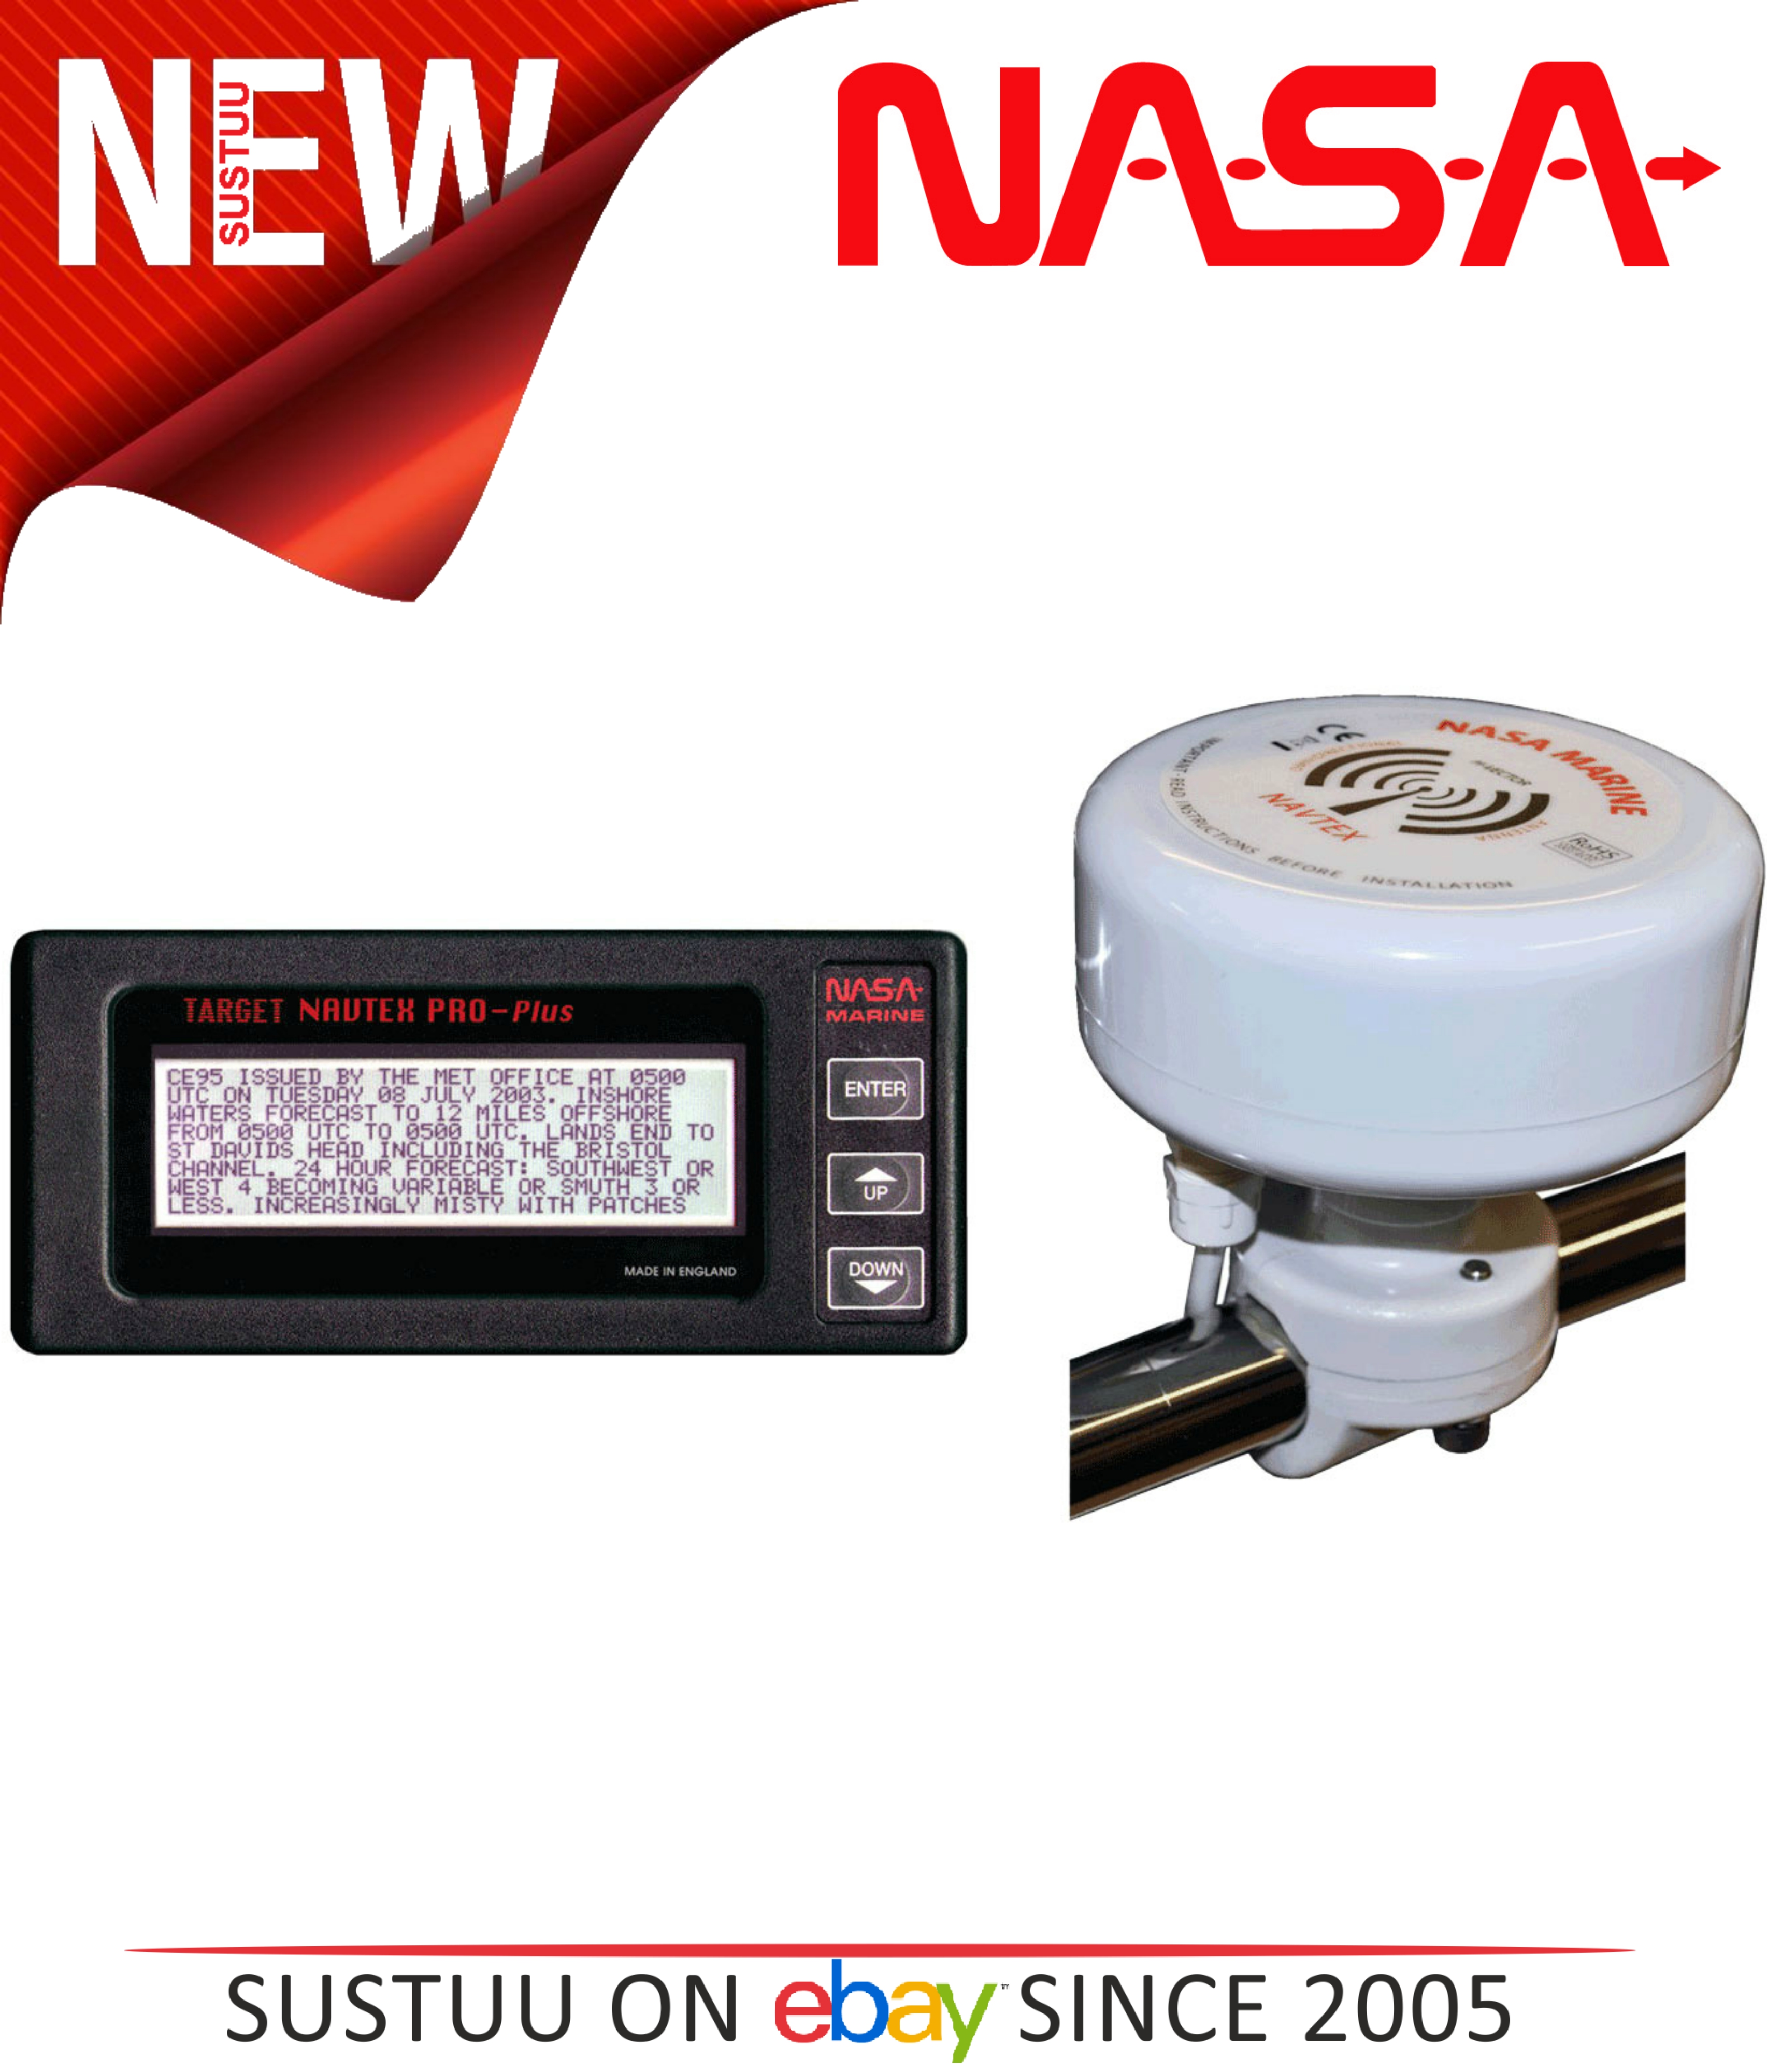 NASA Marine Target Navtex Pro Plus c/w H Vector Antenna 518 & 490 kHz Operation